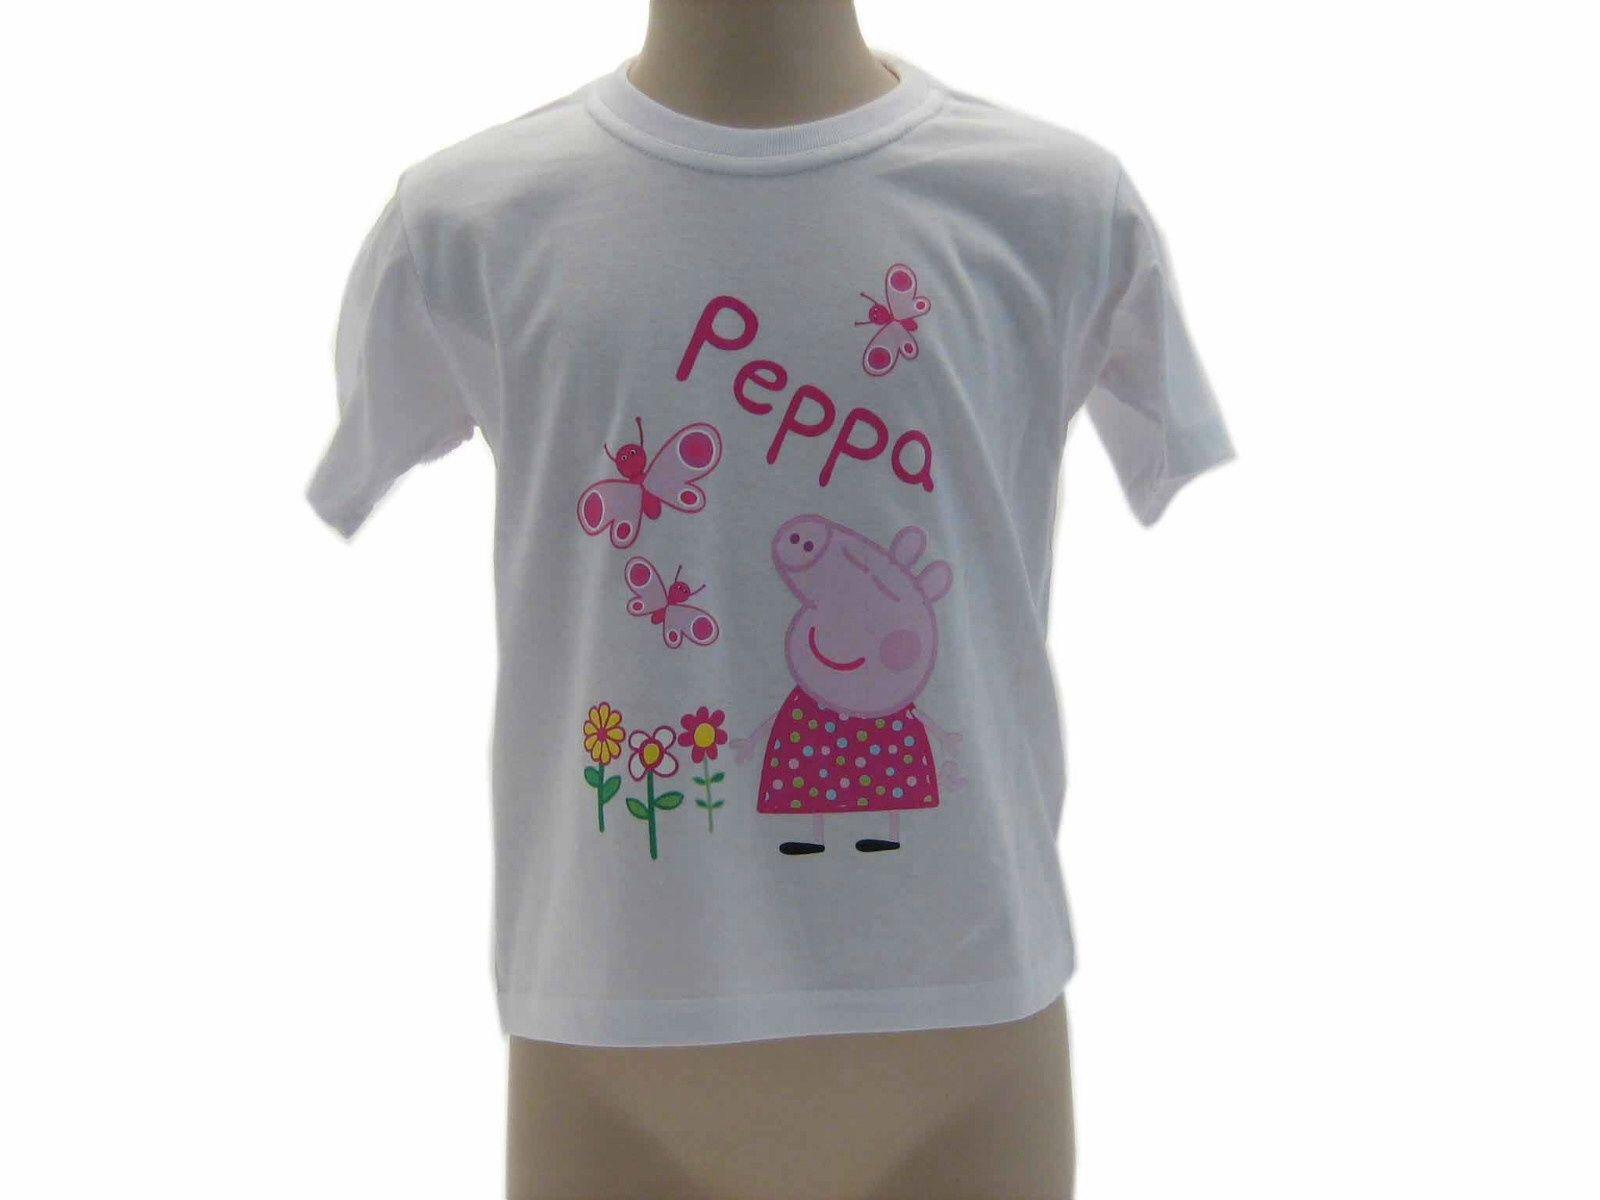 purchase cheap 629f3 58ee0 Peppapig abbigliamento bambini TShirt manica corta maglia di peppapig 2014